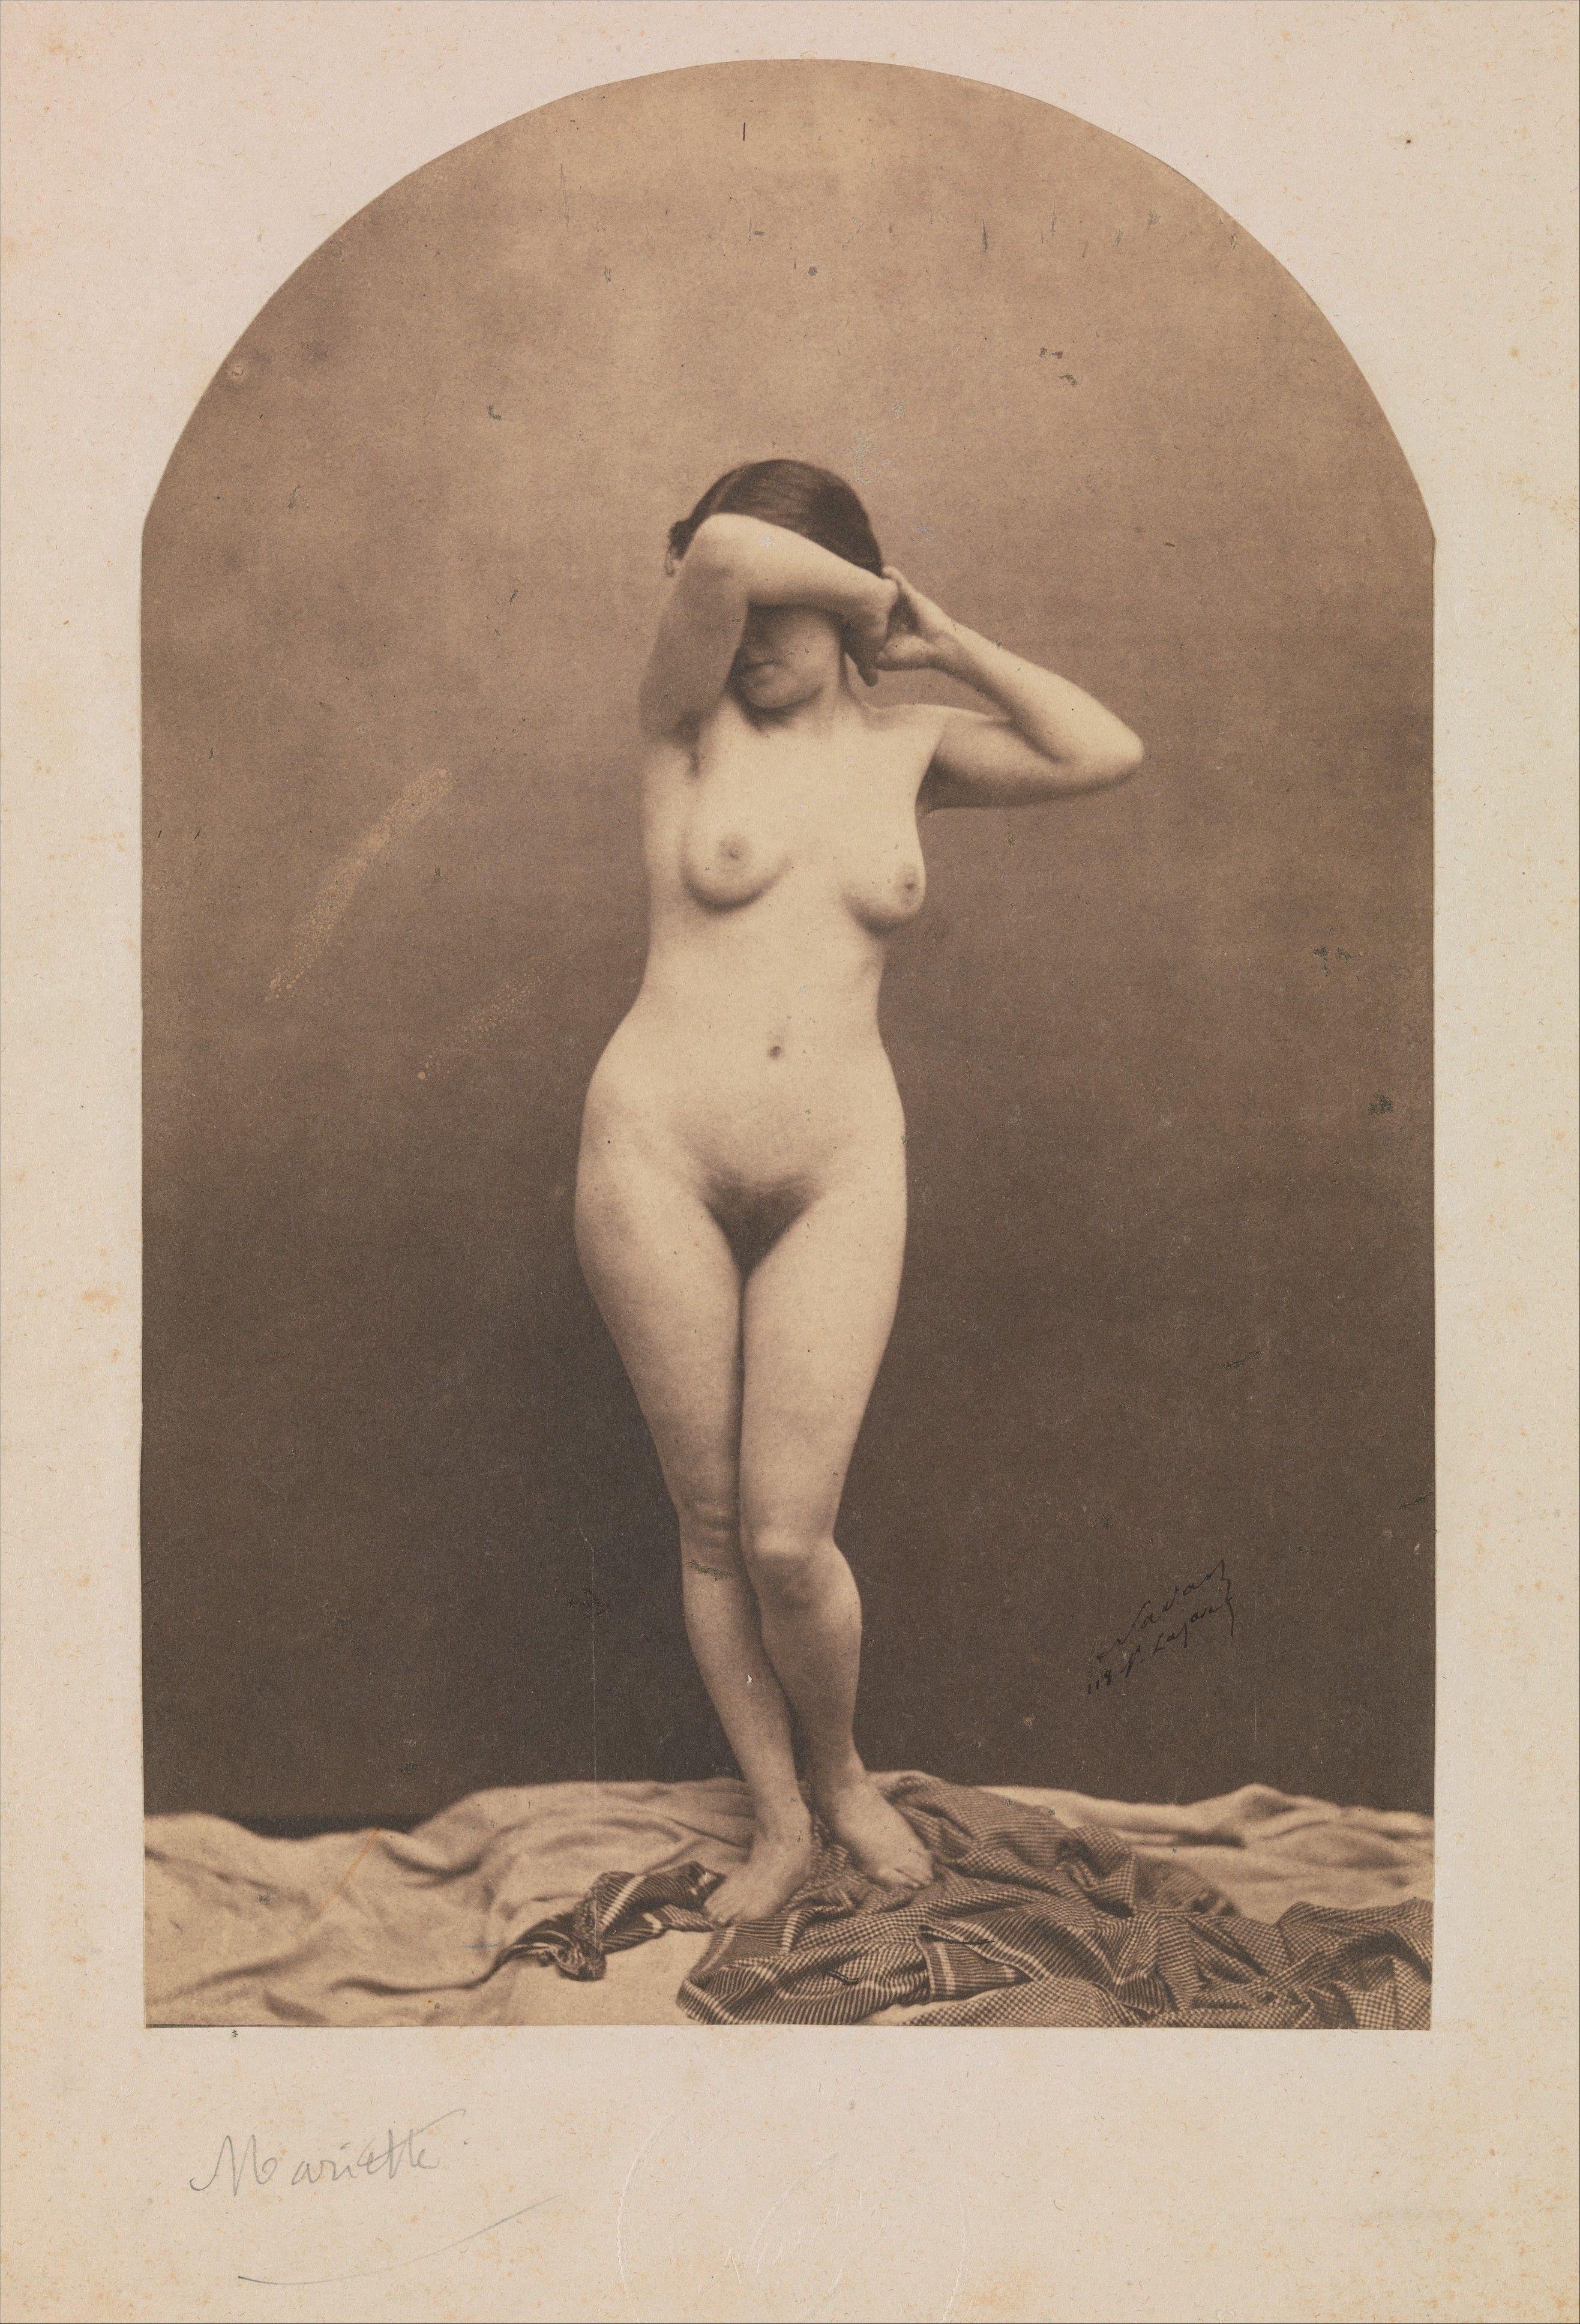 Nude art photography europe